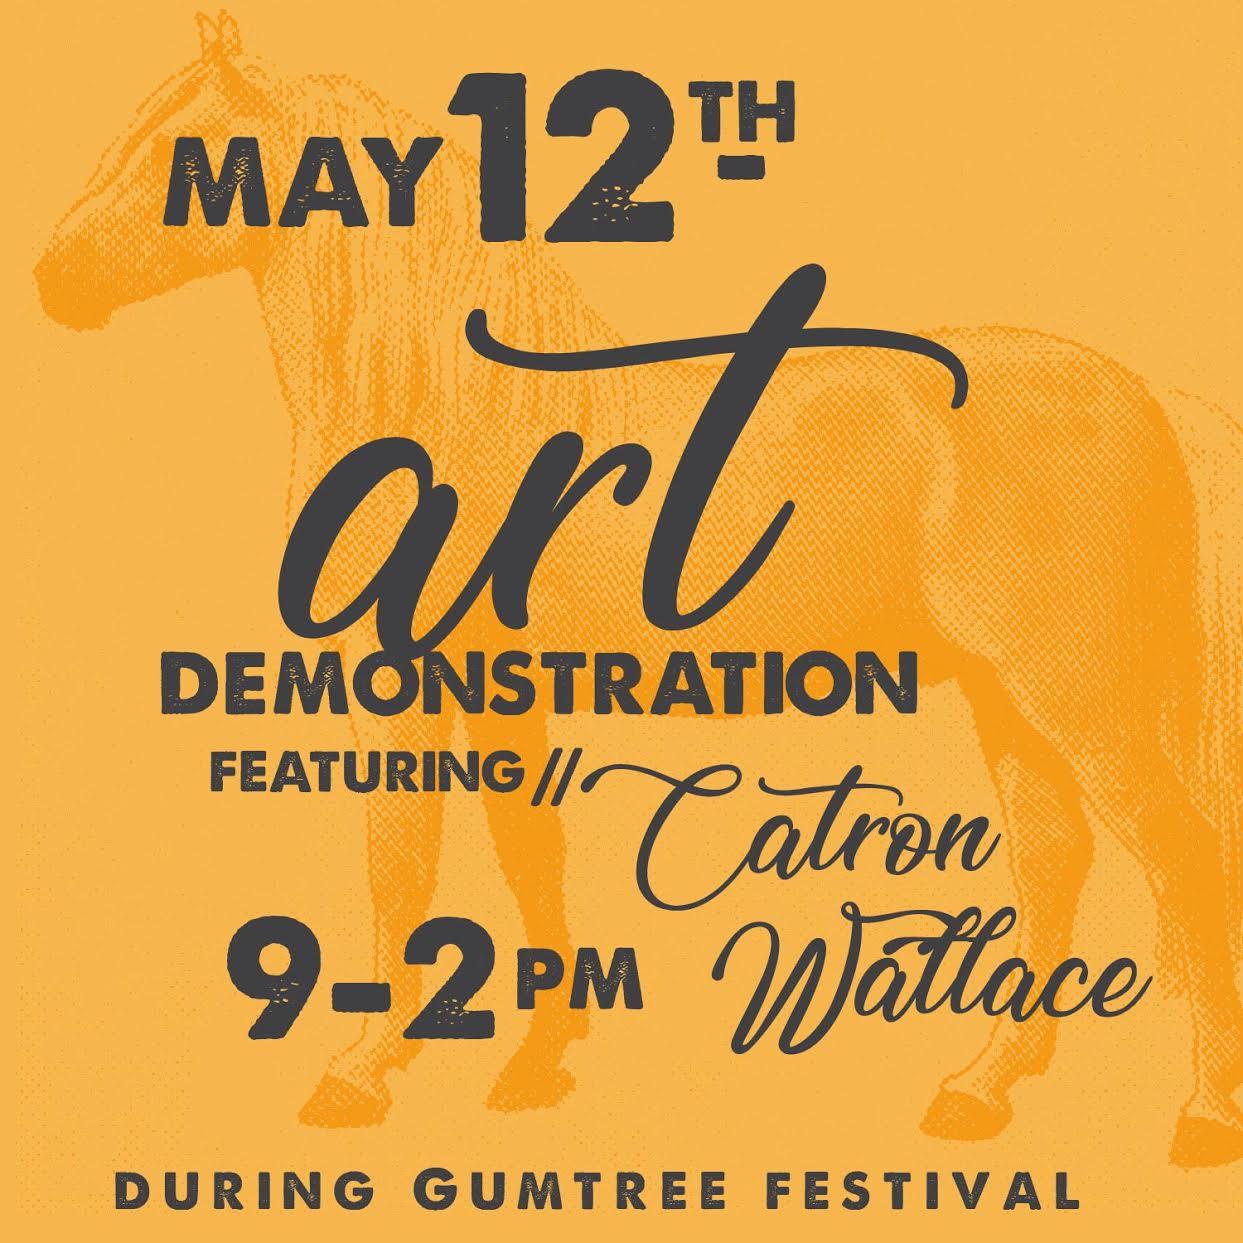 Catron Wallace Caron Gallery Downtown Tupelo